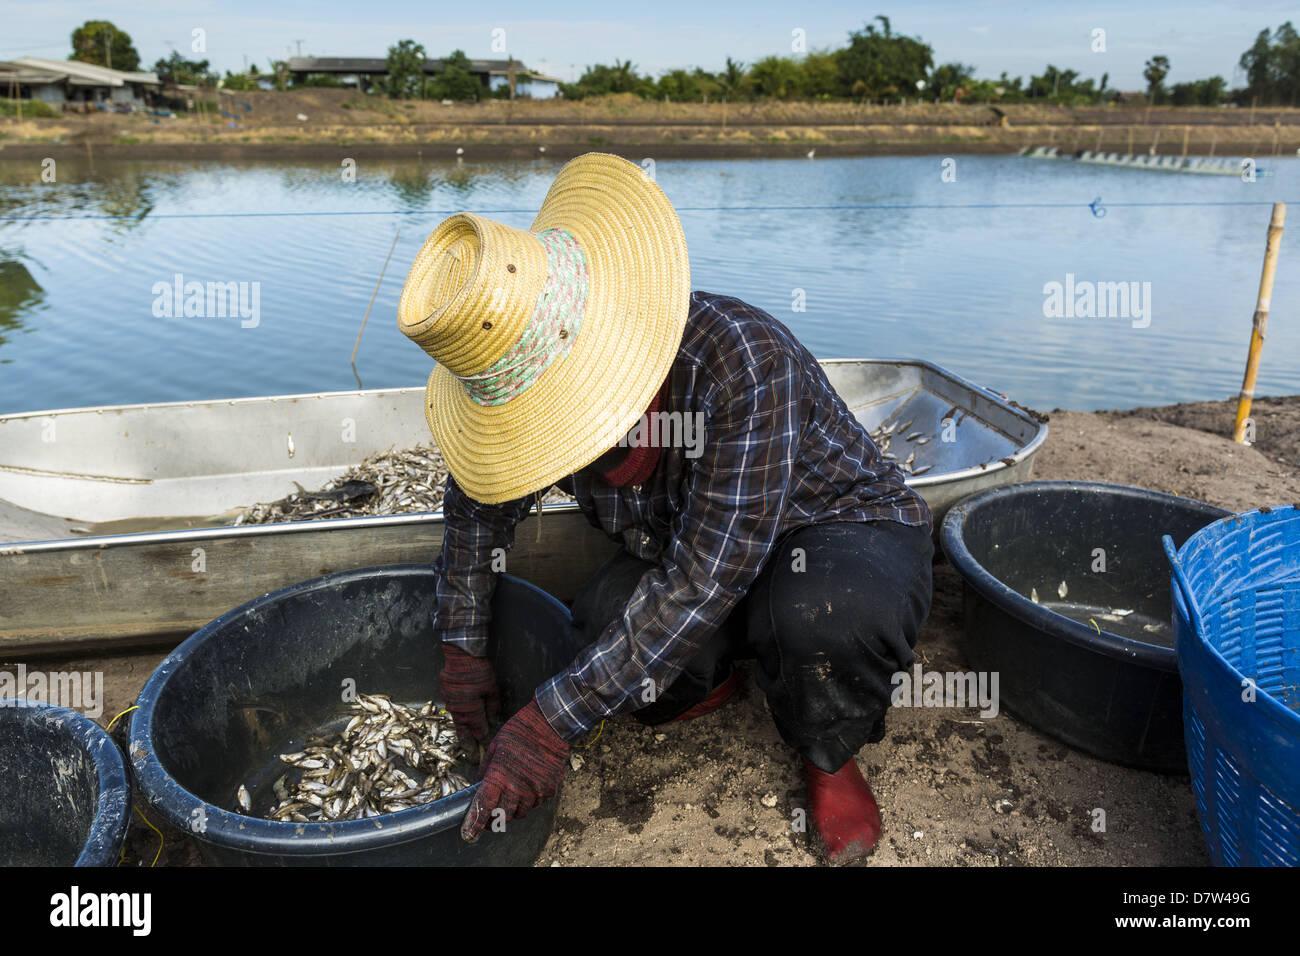 Bangtathen, Saphun Buri, Thailand. May 14, 2013. A worker sorts shrimp in Saphunburi province of Thailand. Early Stock Photo